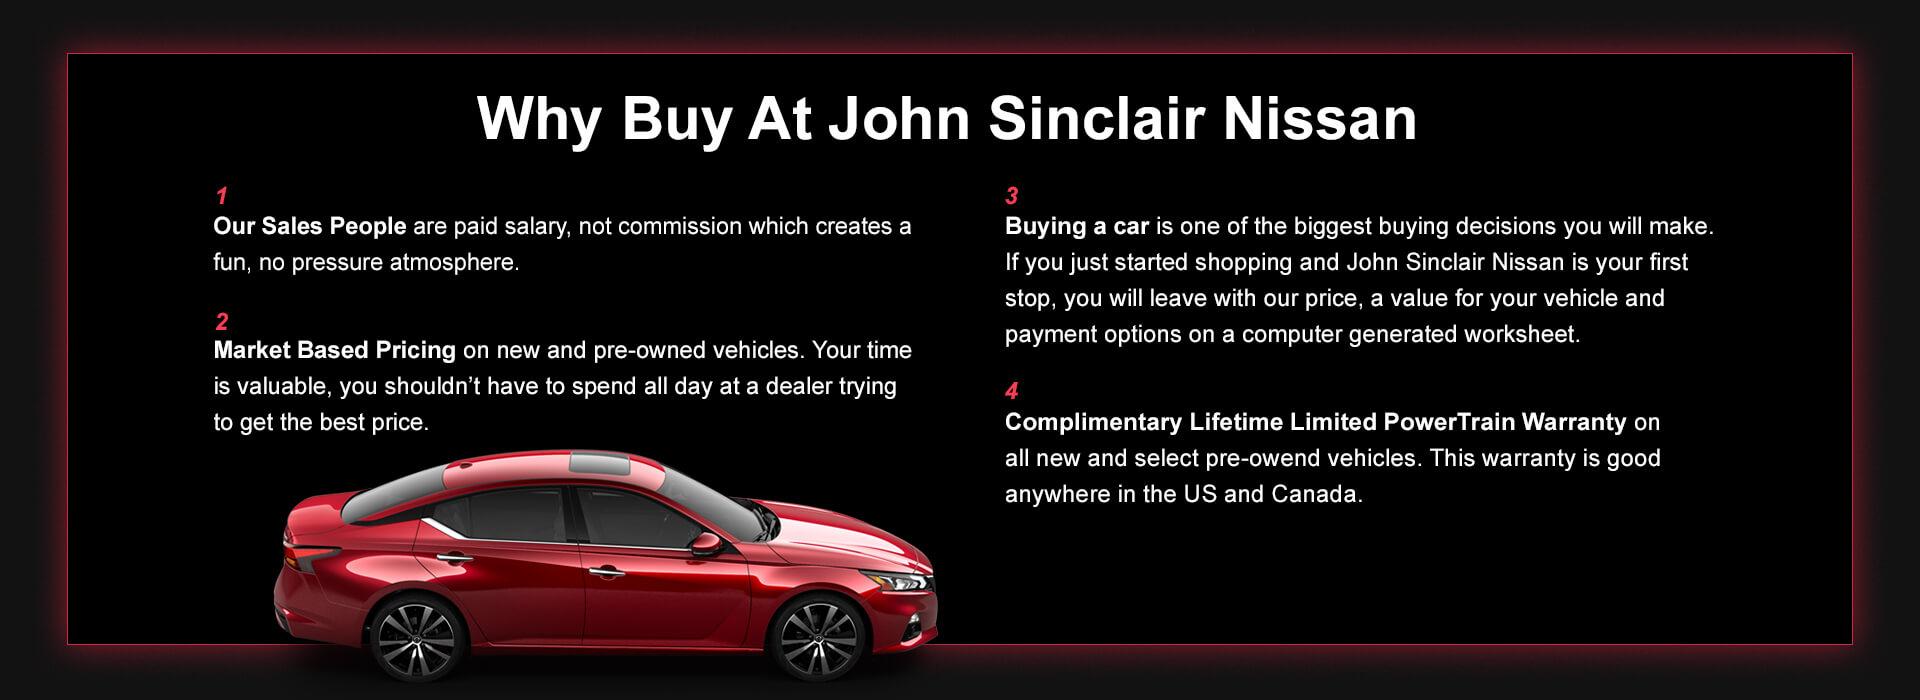 John Sinclair Nissan New Used Nissan Car Dealer Cape Girardeau Mo